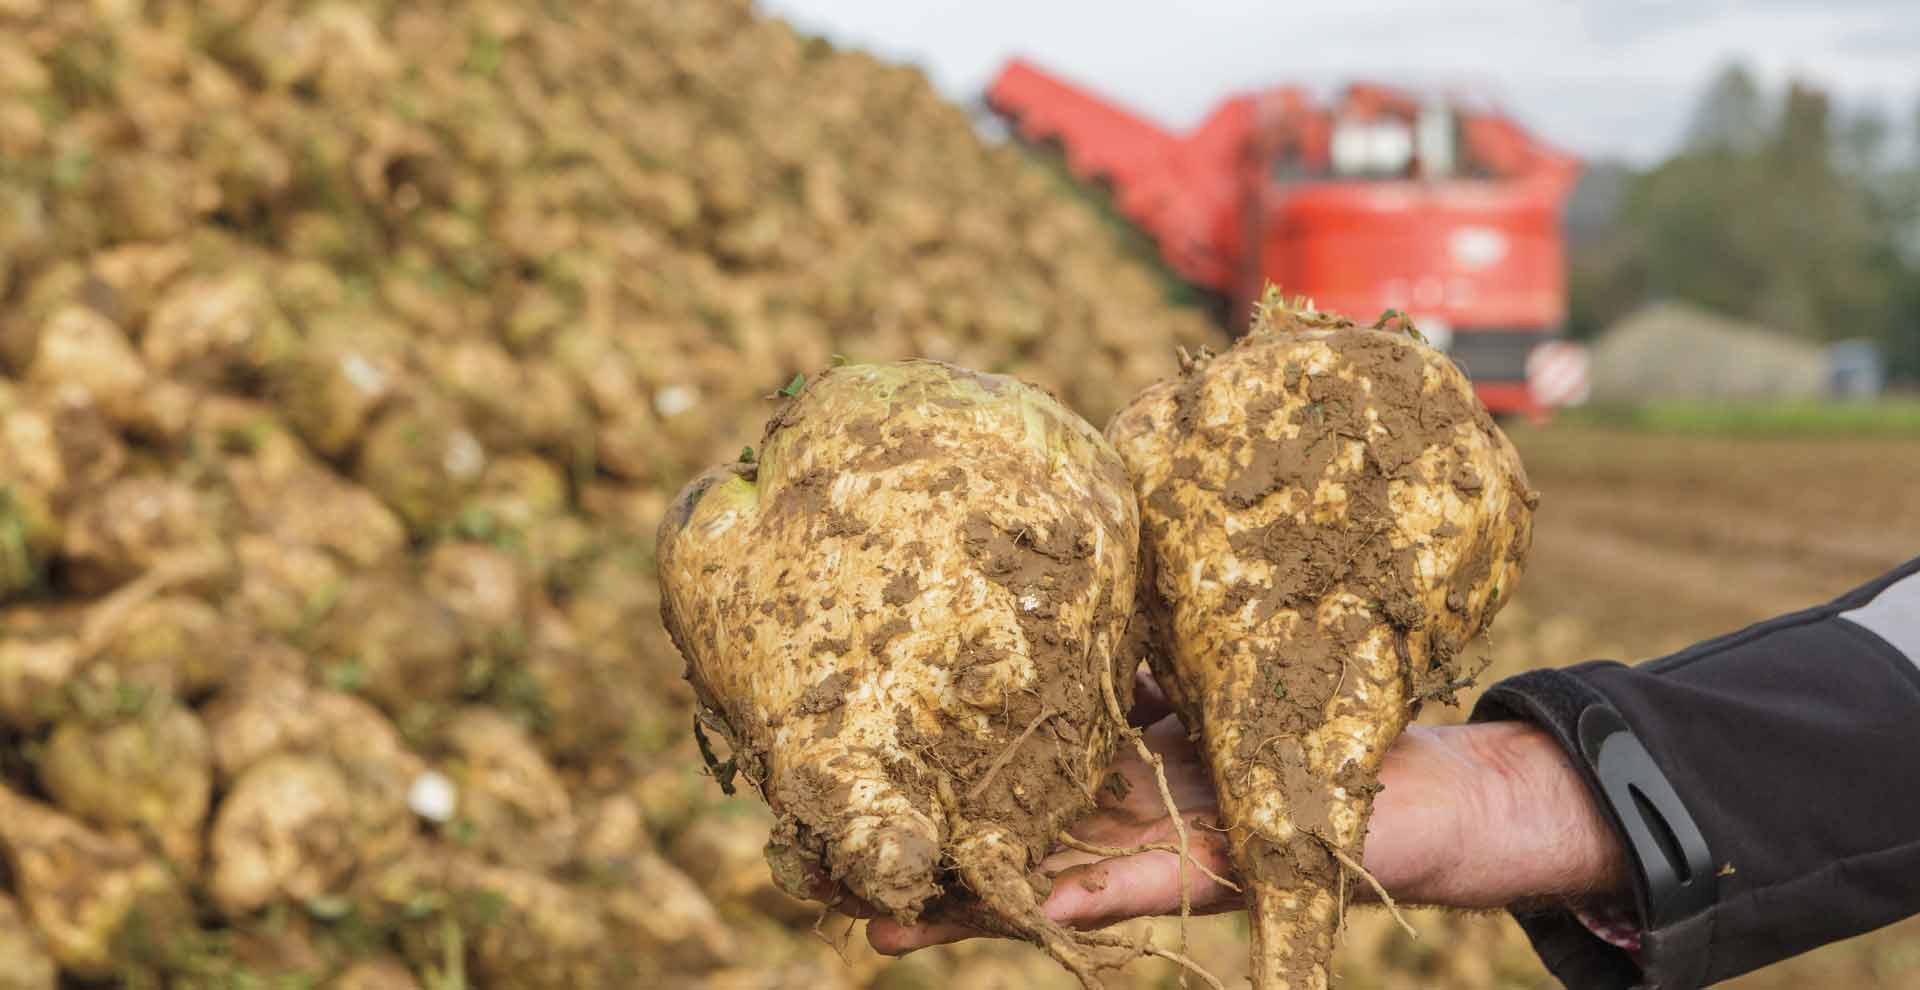 Agrifac LightTraxx beet harvesters